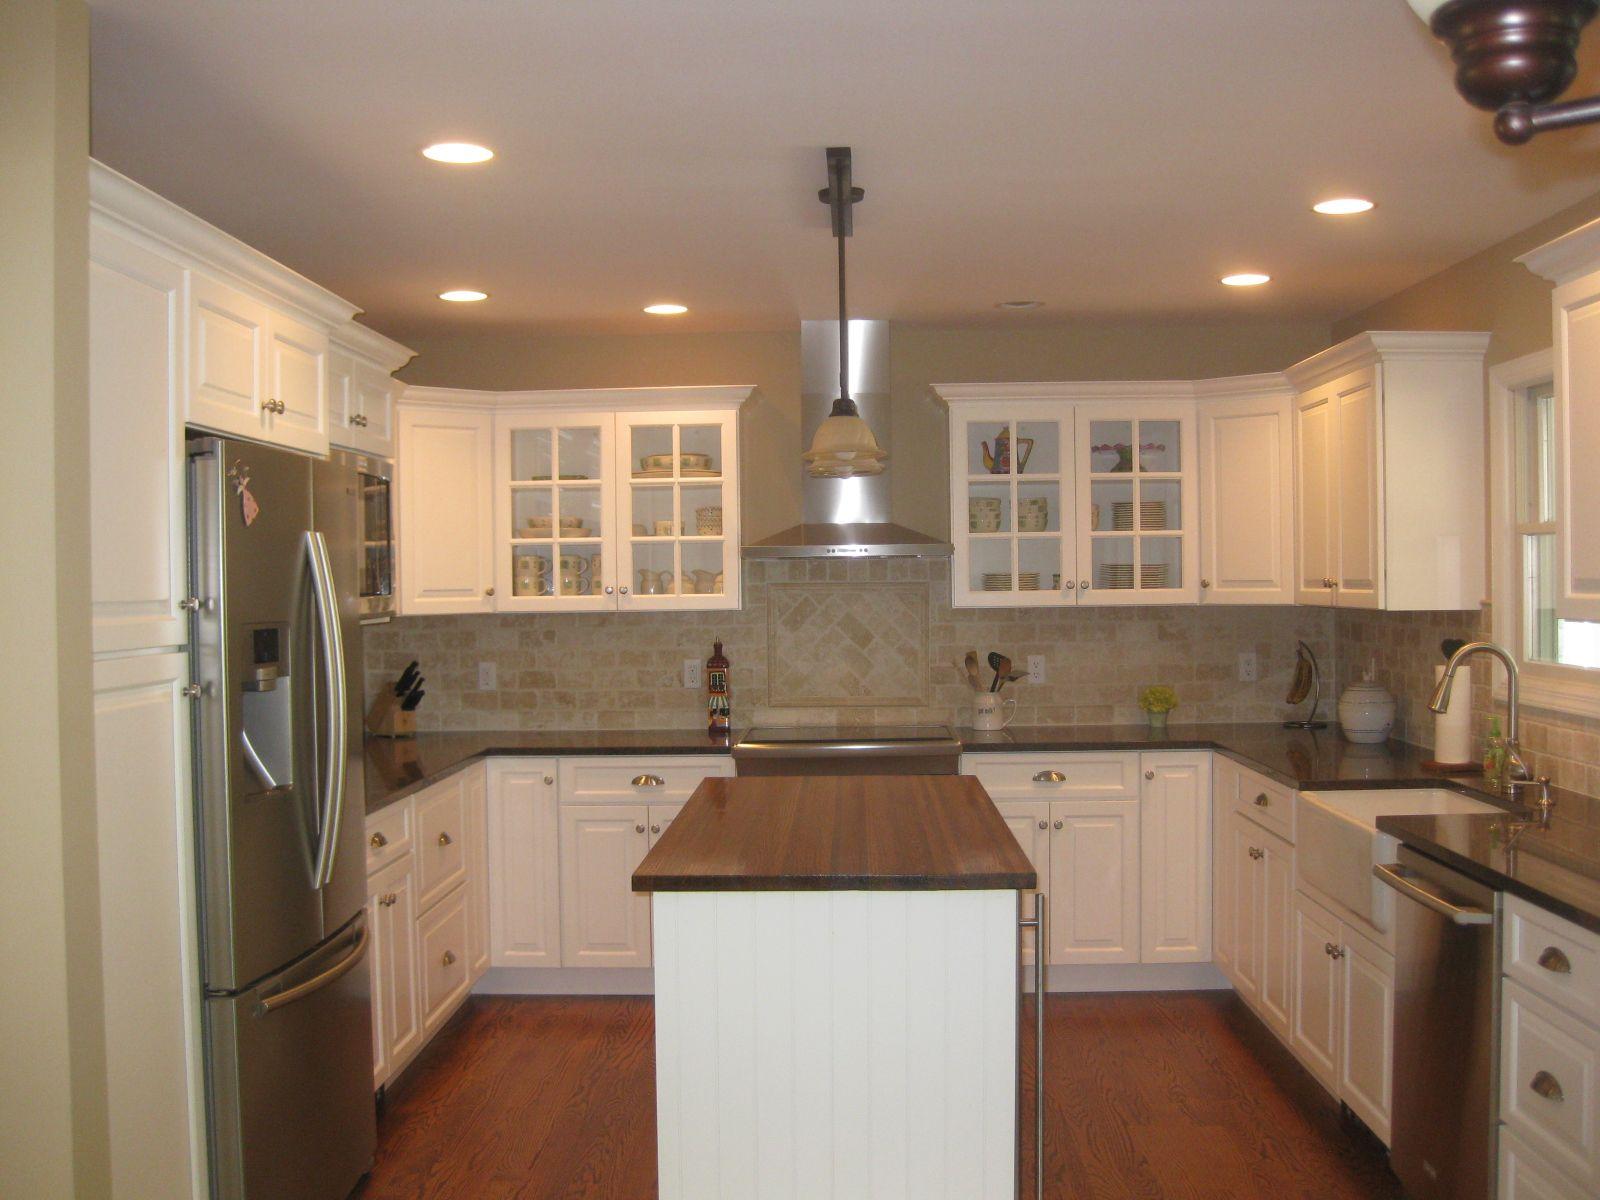 u shaped kitchen kitchen pinterest shapes kitchens and kitchen sets on kitchen ideas u shaped layout id=35179